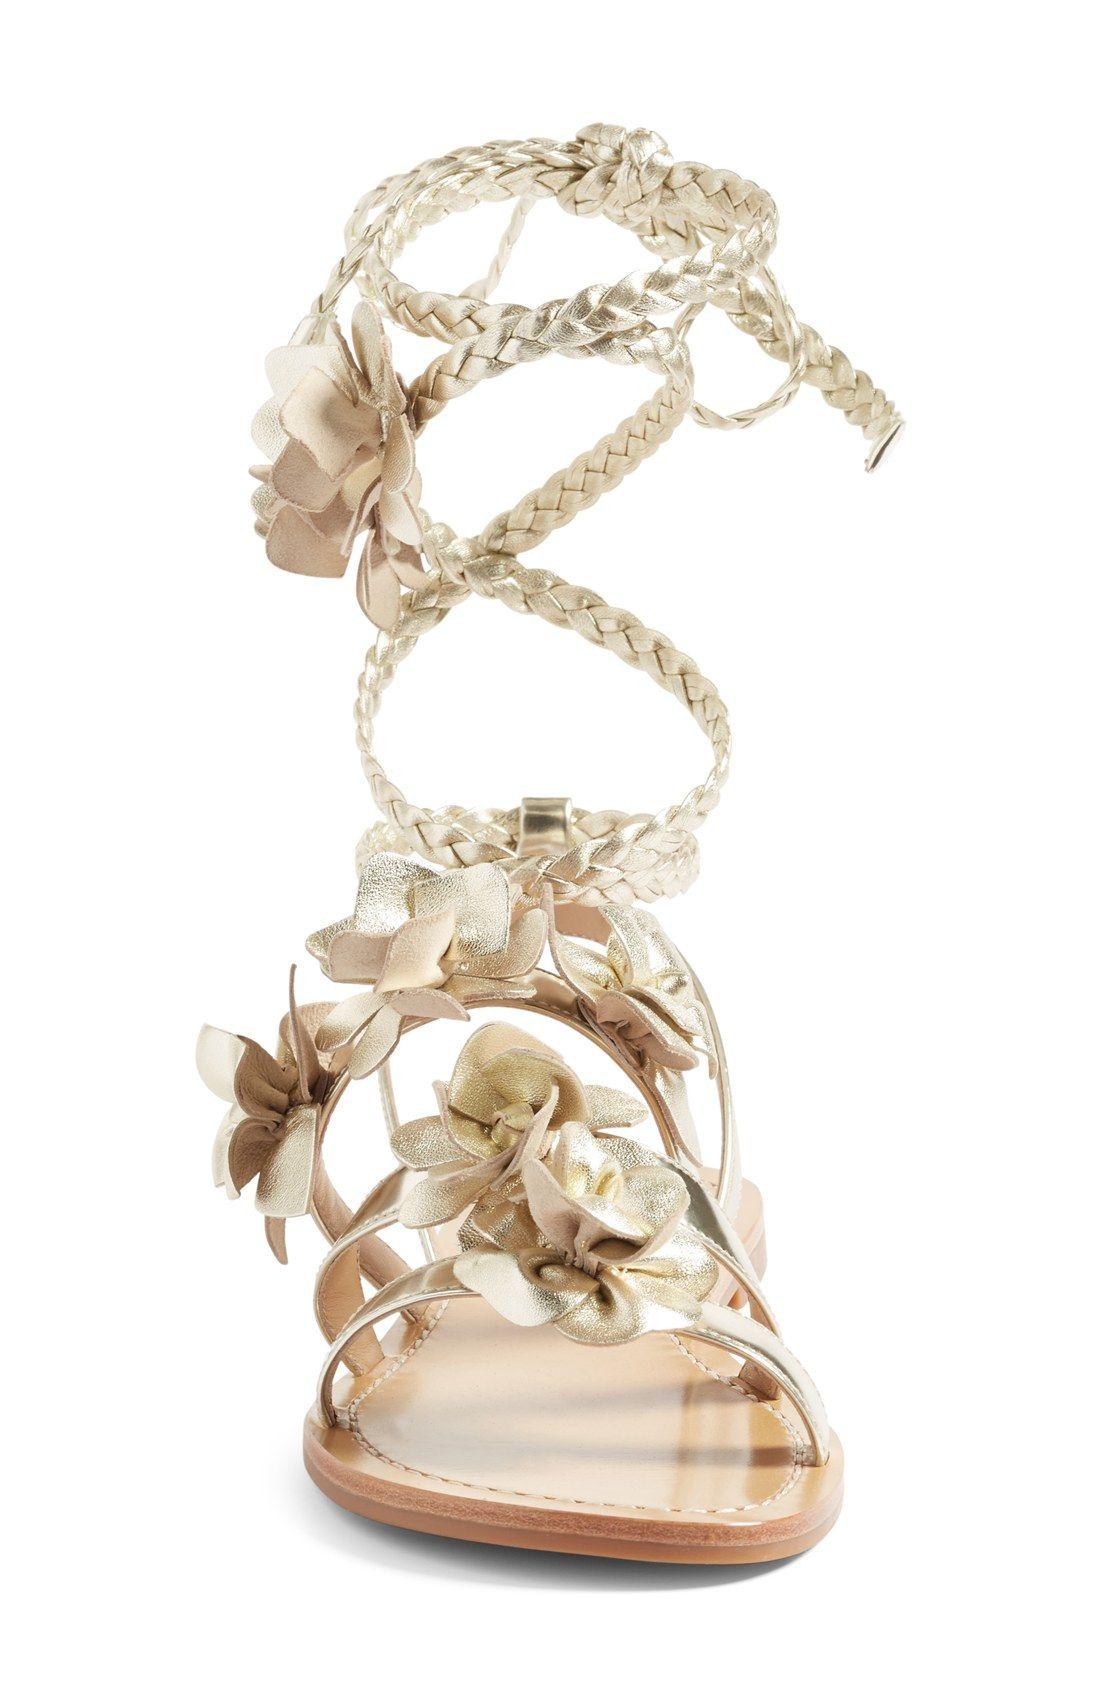 4abe37066354d Free shipping and returns on Tory Burch Blossom Gladiator Sandal (Women) at  Nordstrom.com. Fierce meets feminine on this stunning metallic gladiator  sandal ...